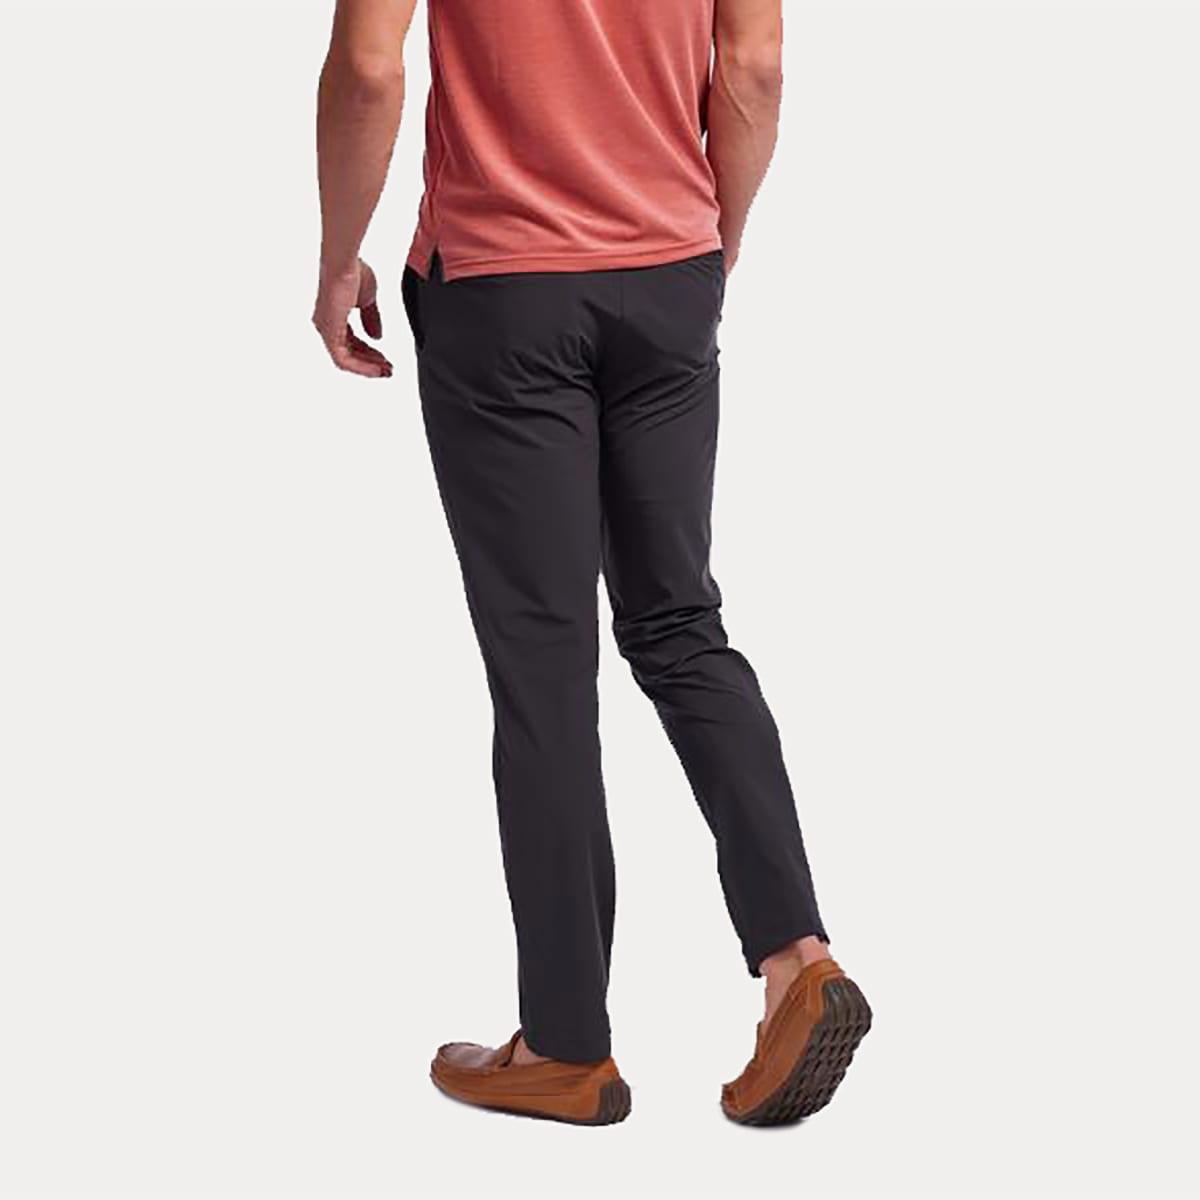 9d56d17fa21c3 Lightweight Mens Dress Pants – DACC